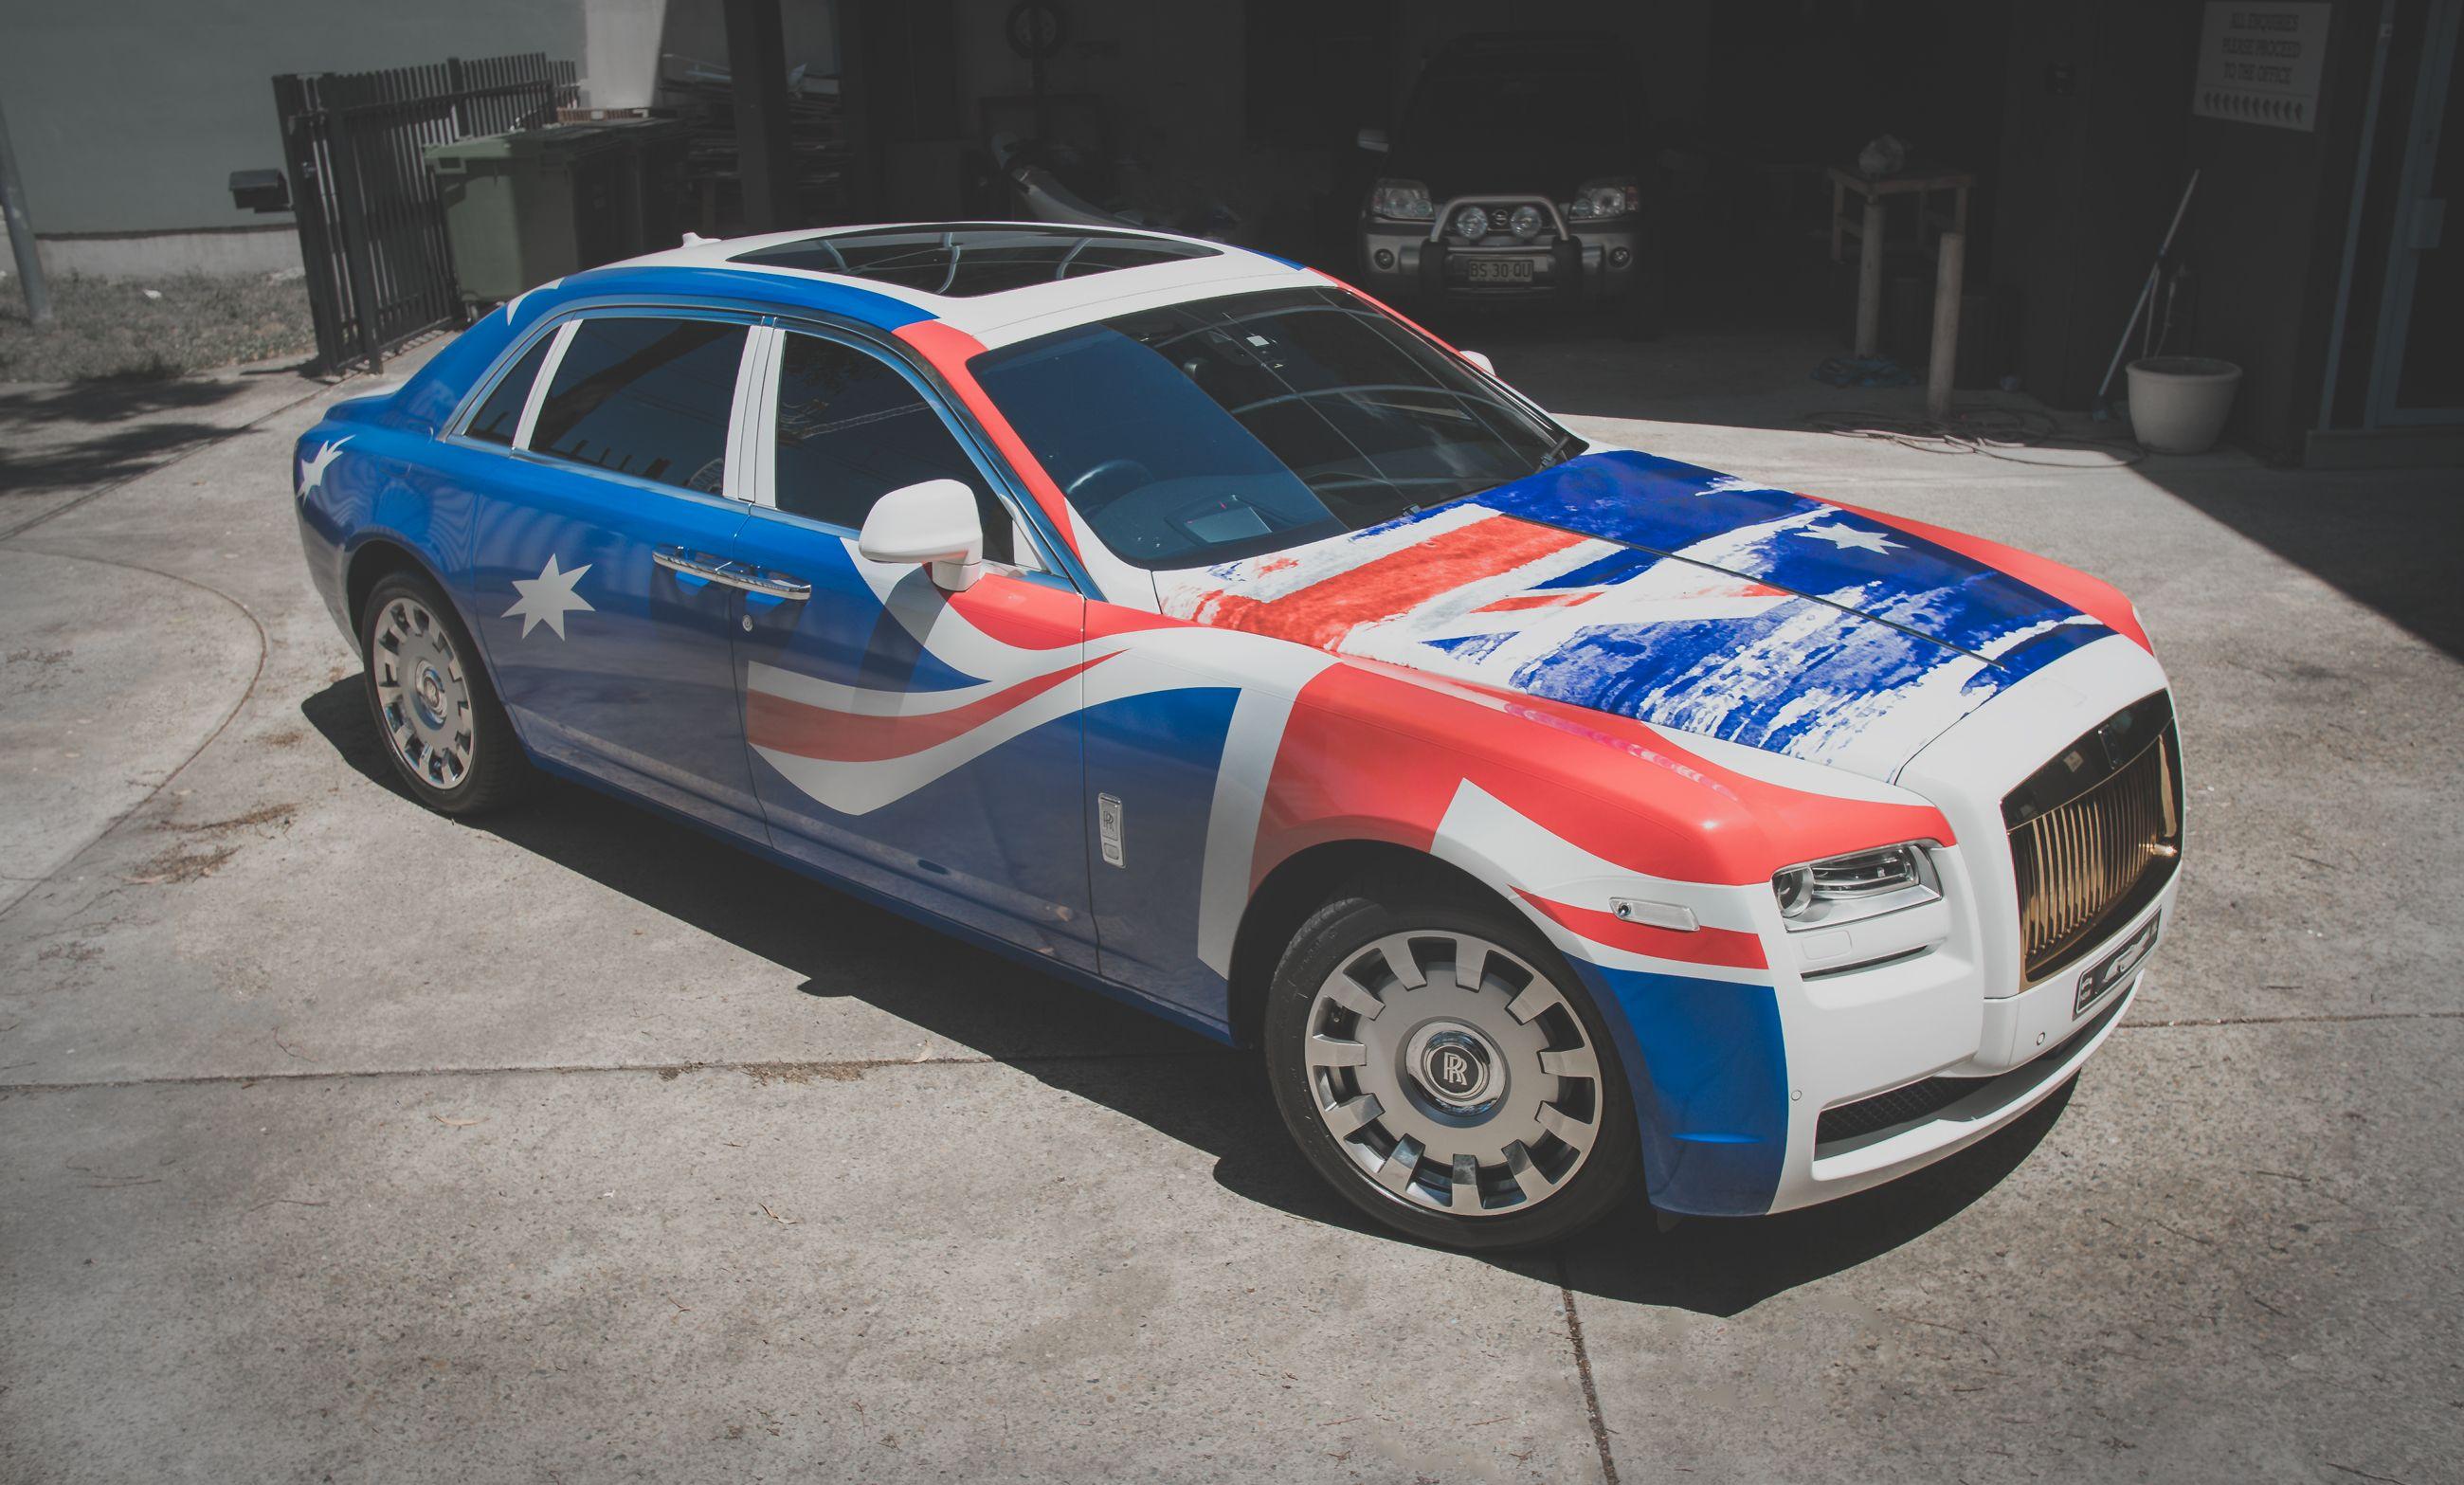 Nothing Says Australia Like Getting Your Car Vinyl Wrapped In The Australian Flag Car Wrap Vinyl Wrap Car Car